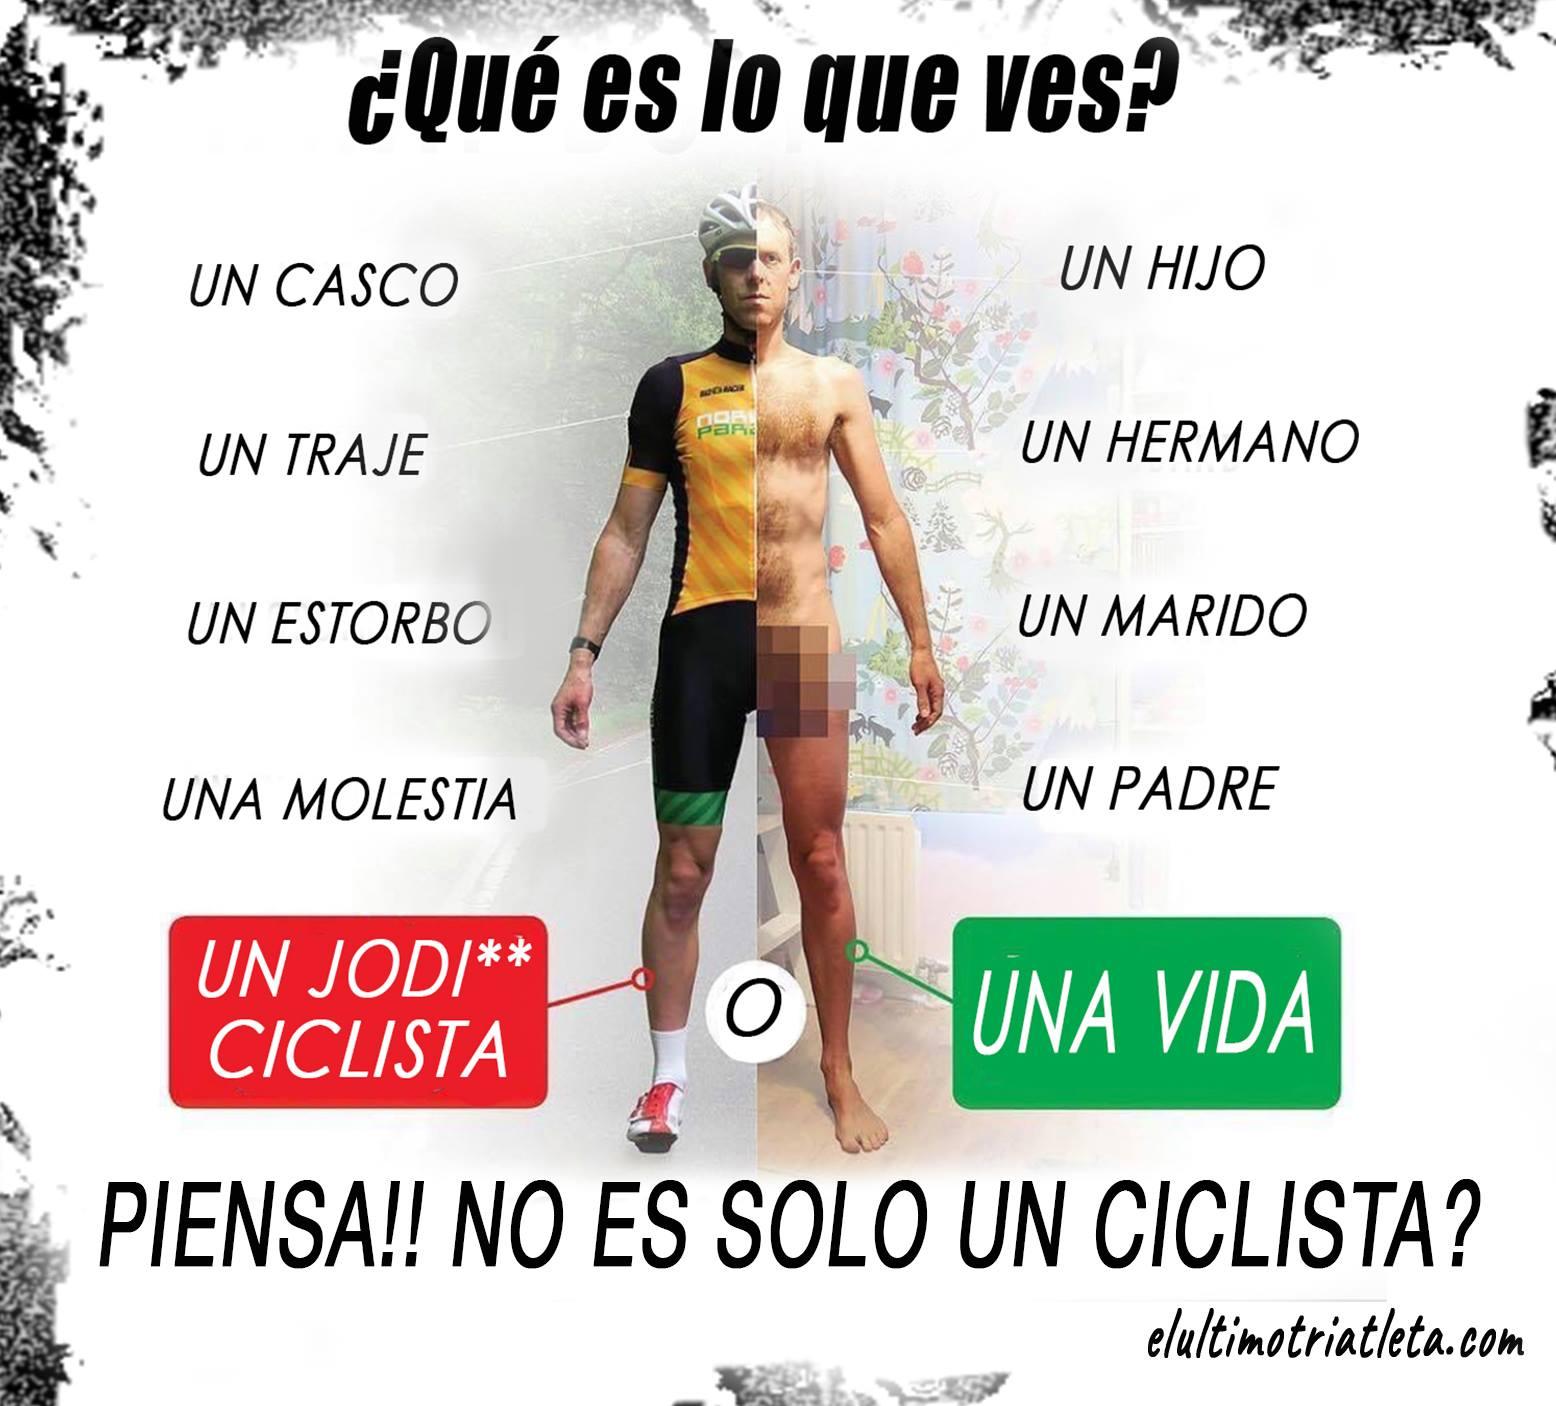 frase concienciacion para respetar a ciclistas